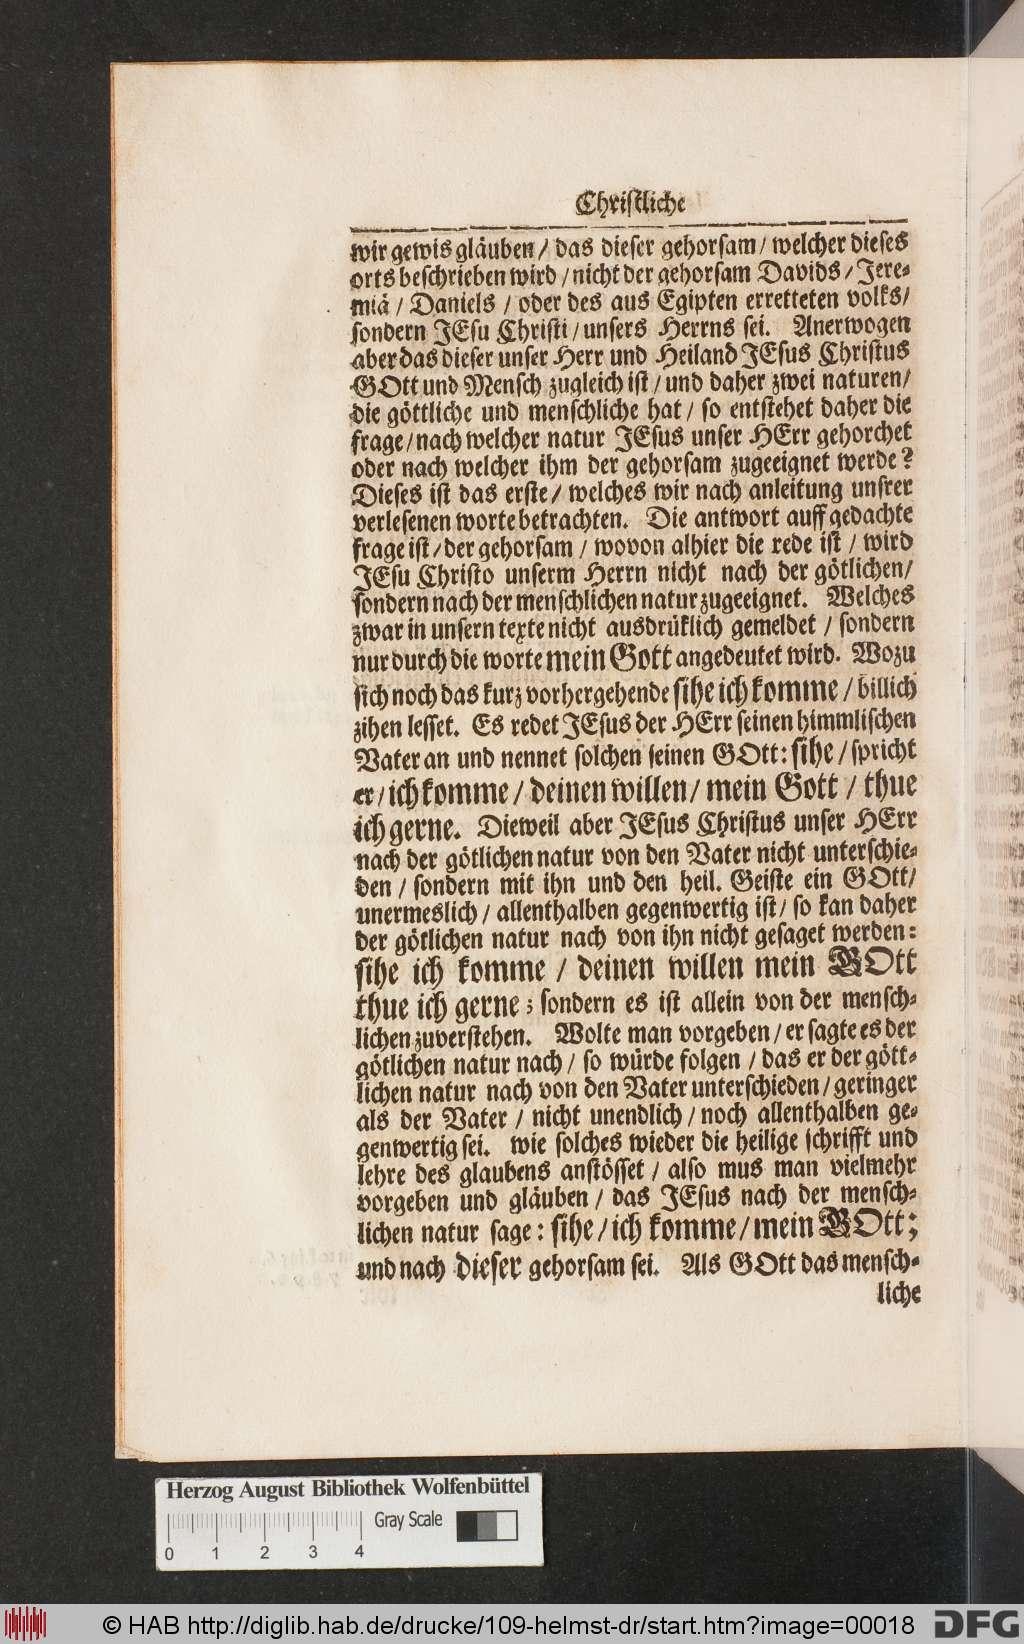 http://diglib.hab.de/drucke/109-helmst-dr/00018.jpg